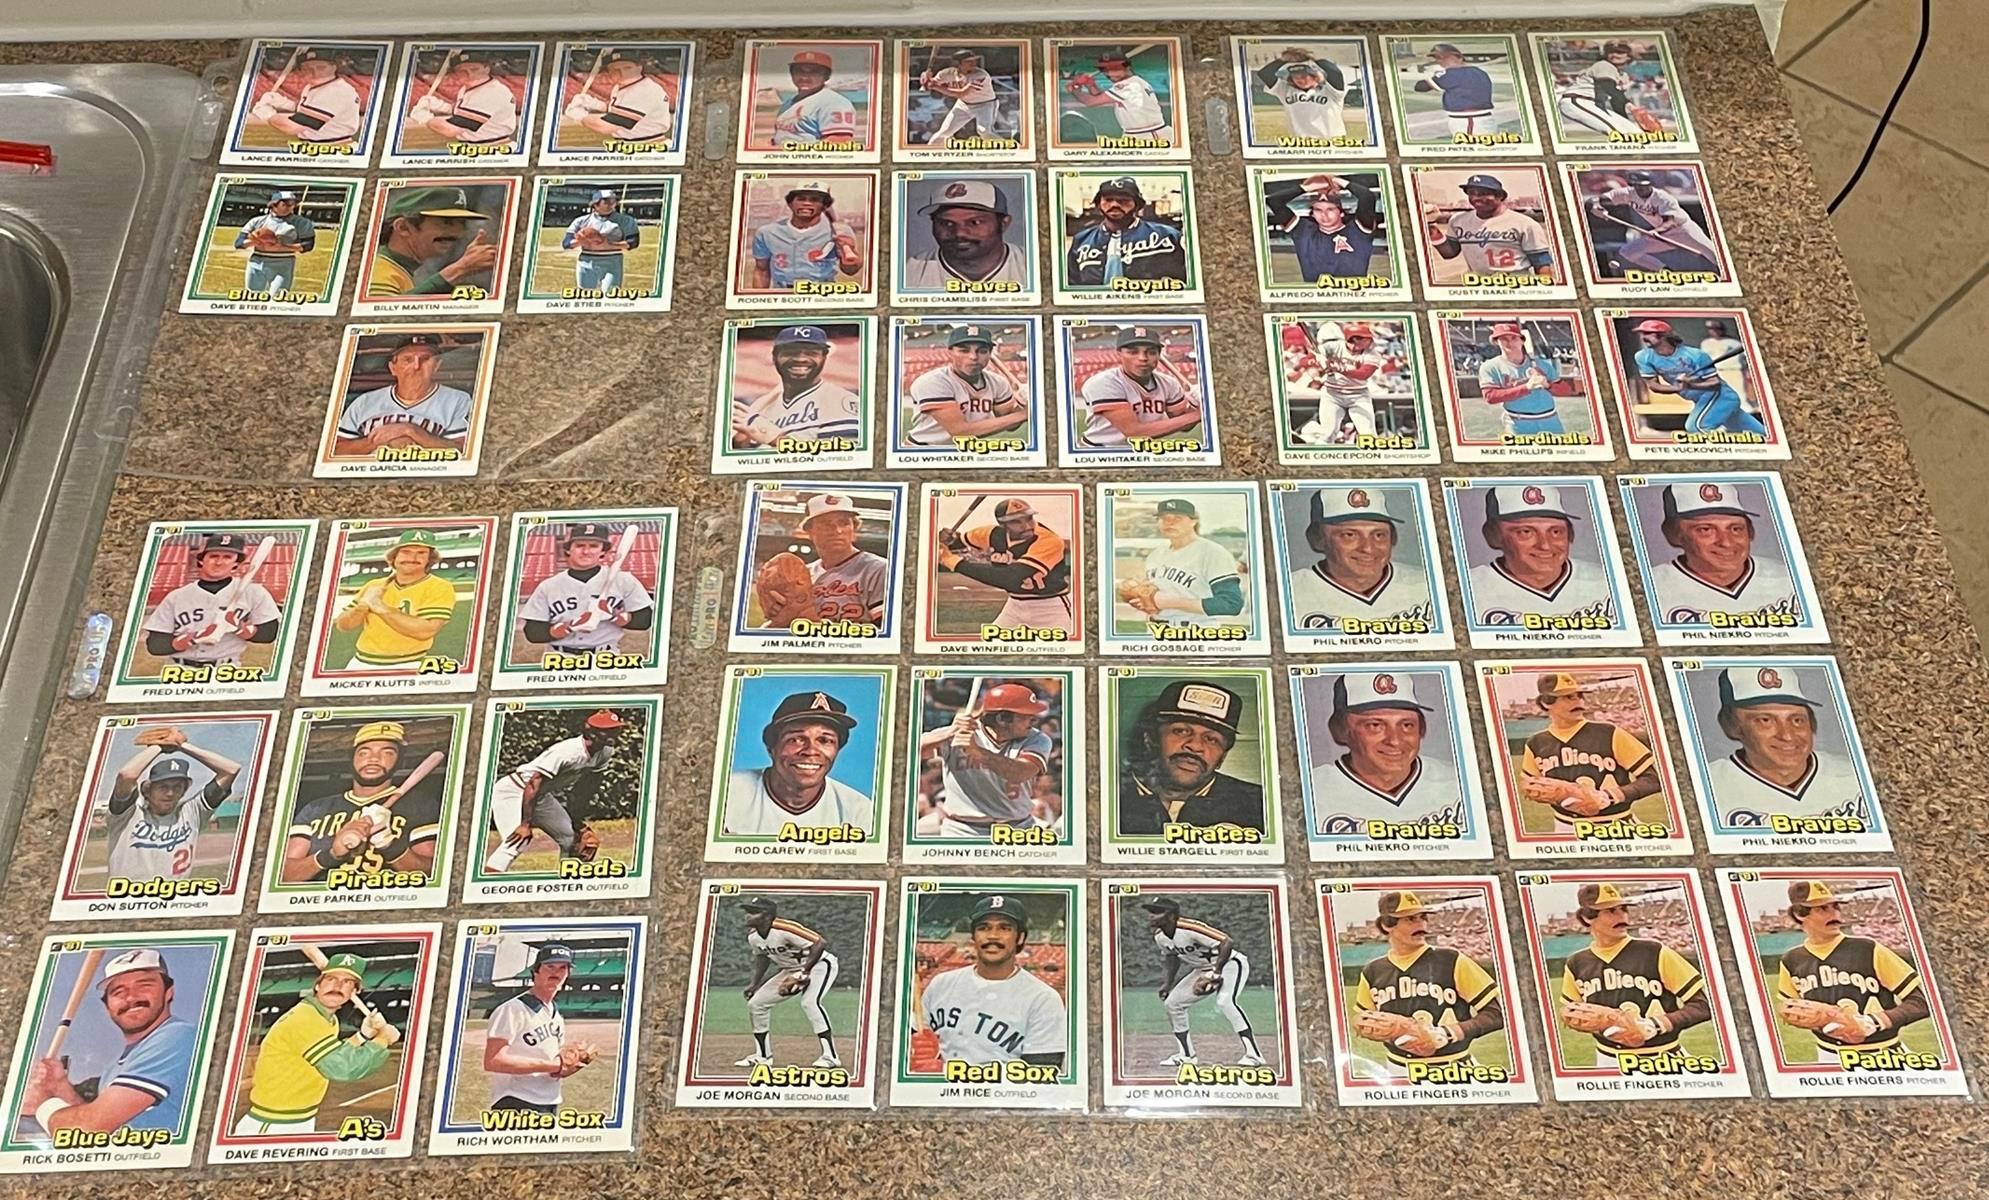 Vintage 1981 Donruss Lot of 52 Baseball Cards (Bench, Palmer, Winfield, Stargell, Carew, Morgan, Fingers, Rice, Etc..)